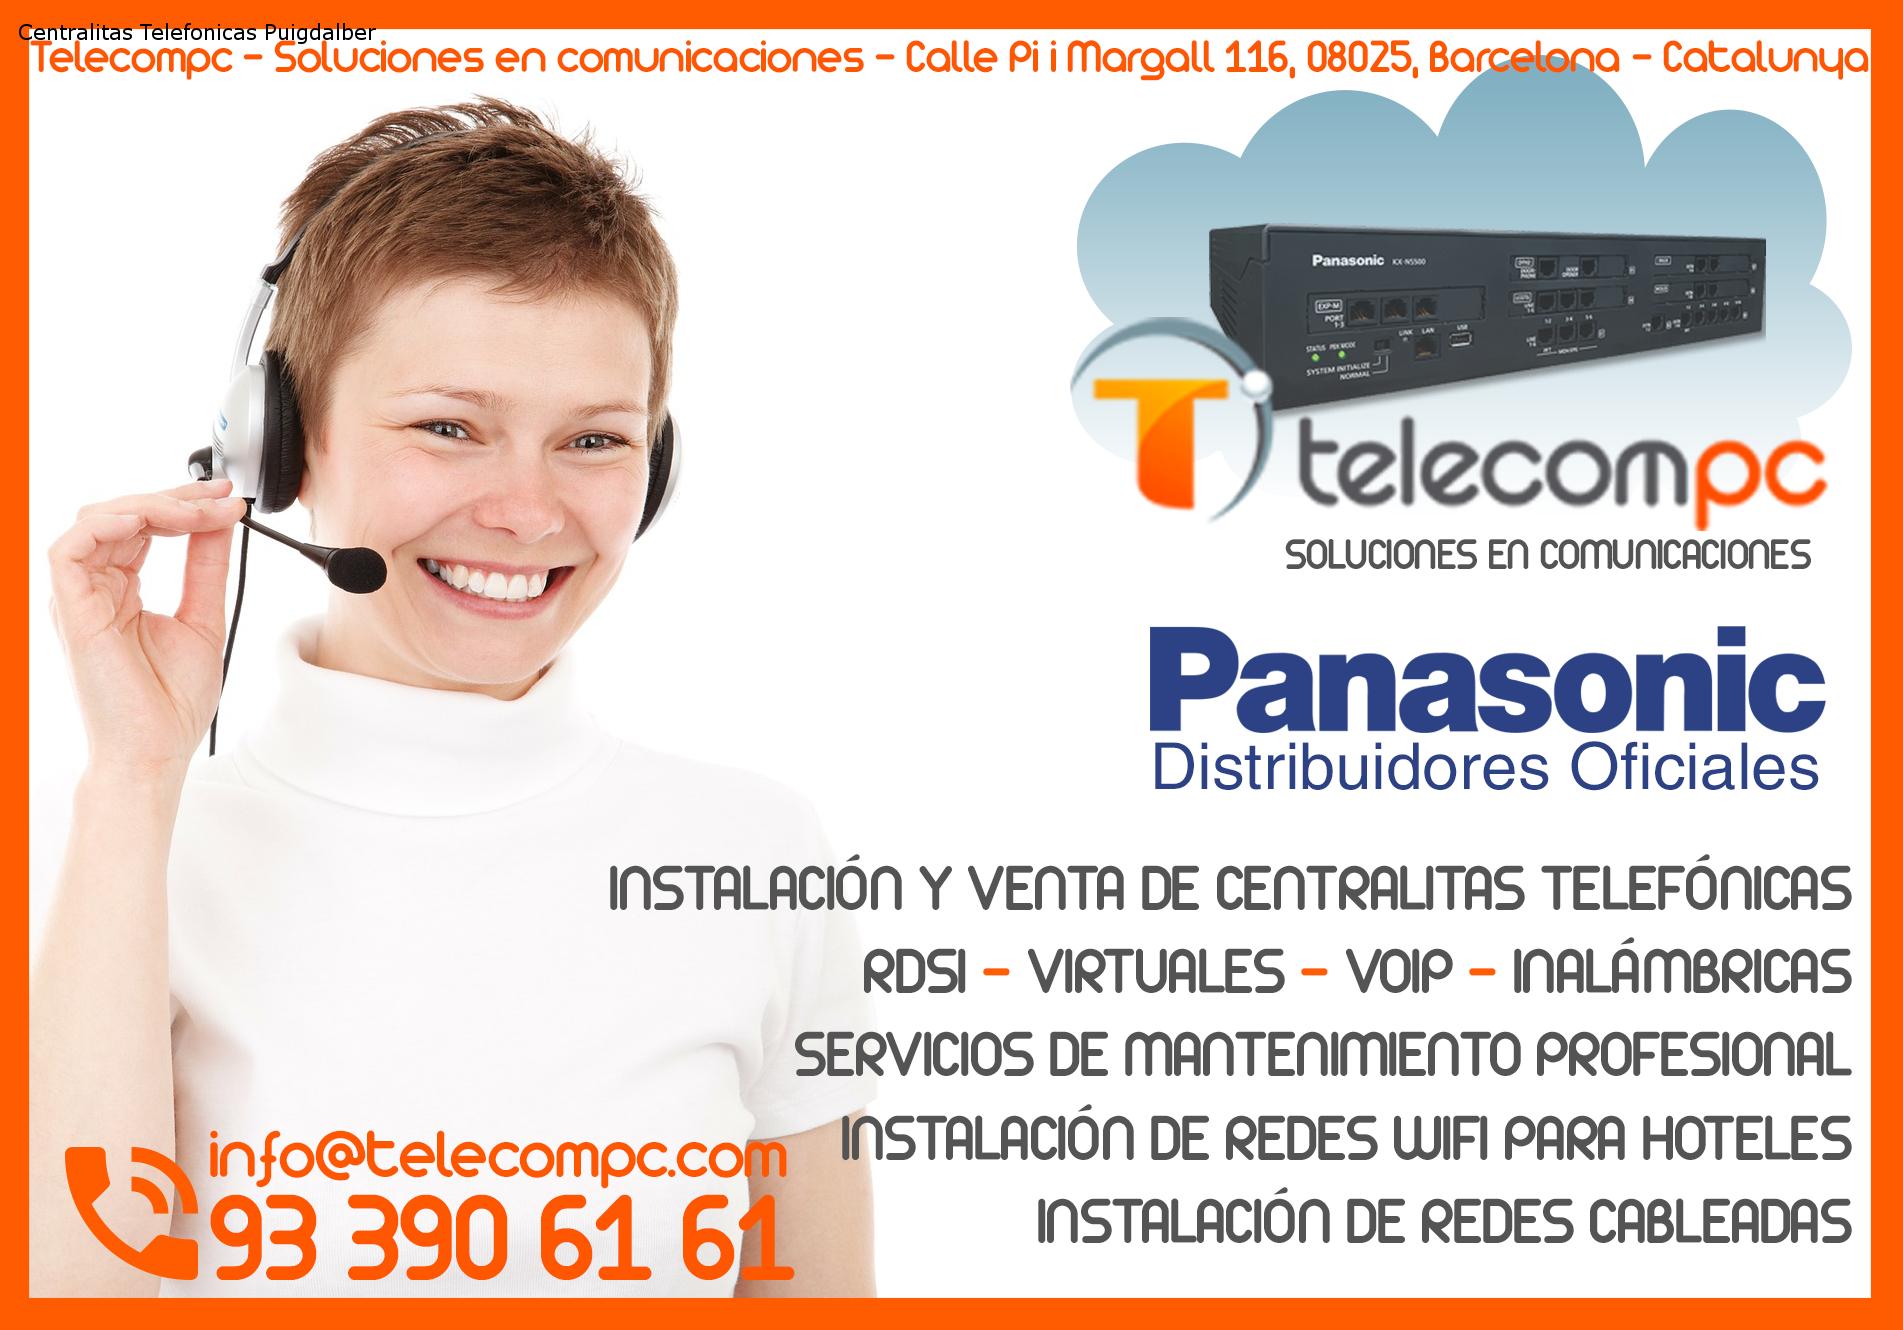 Centralitas Telefonicas Puigdalber